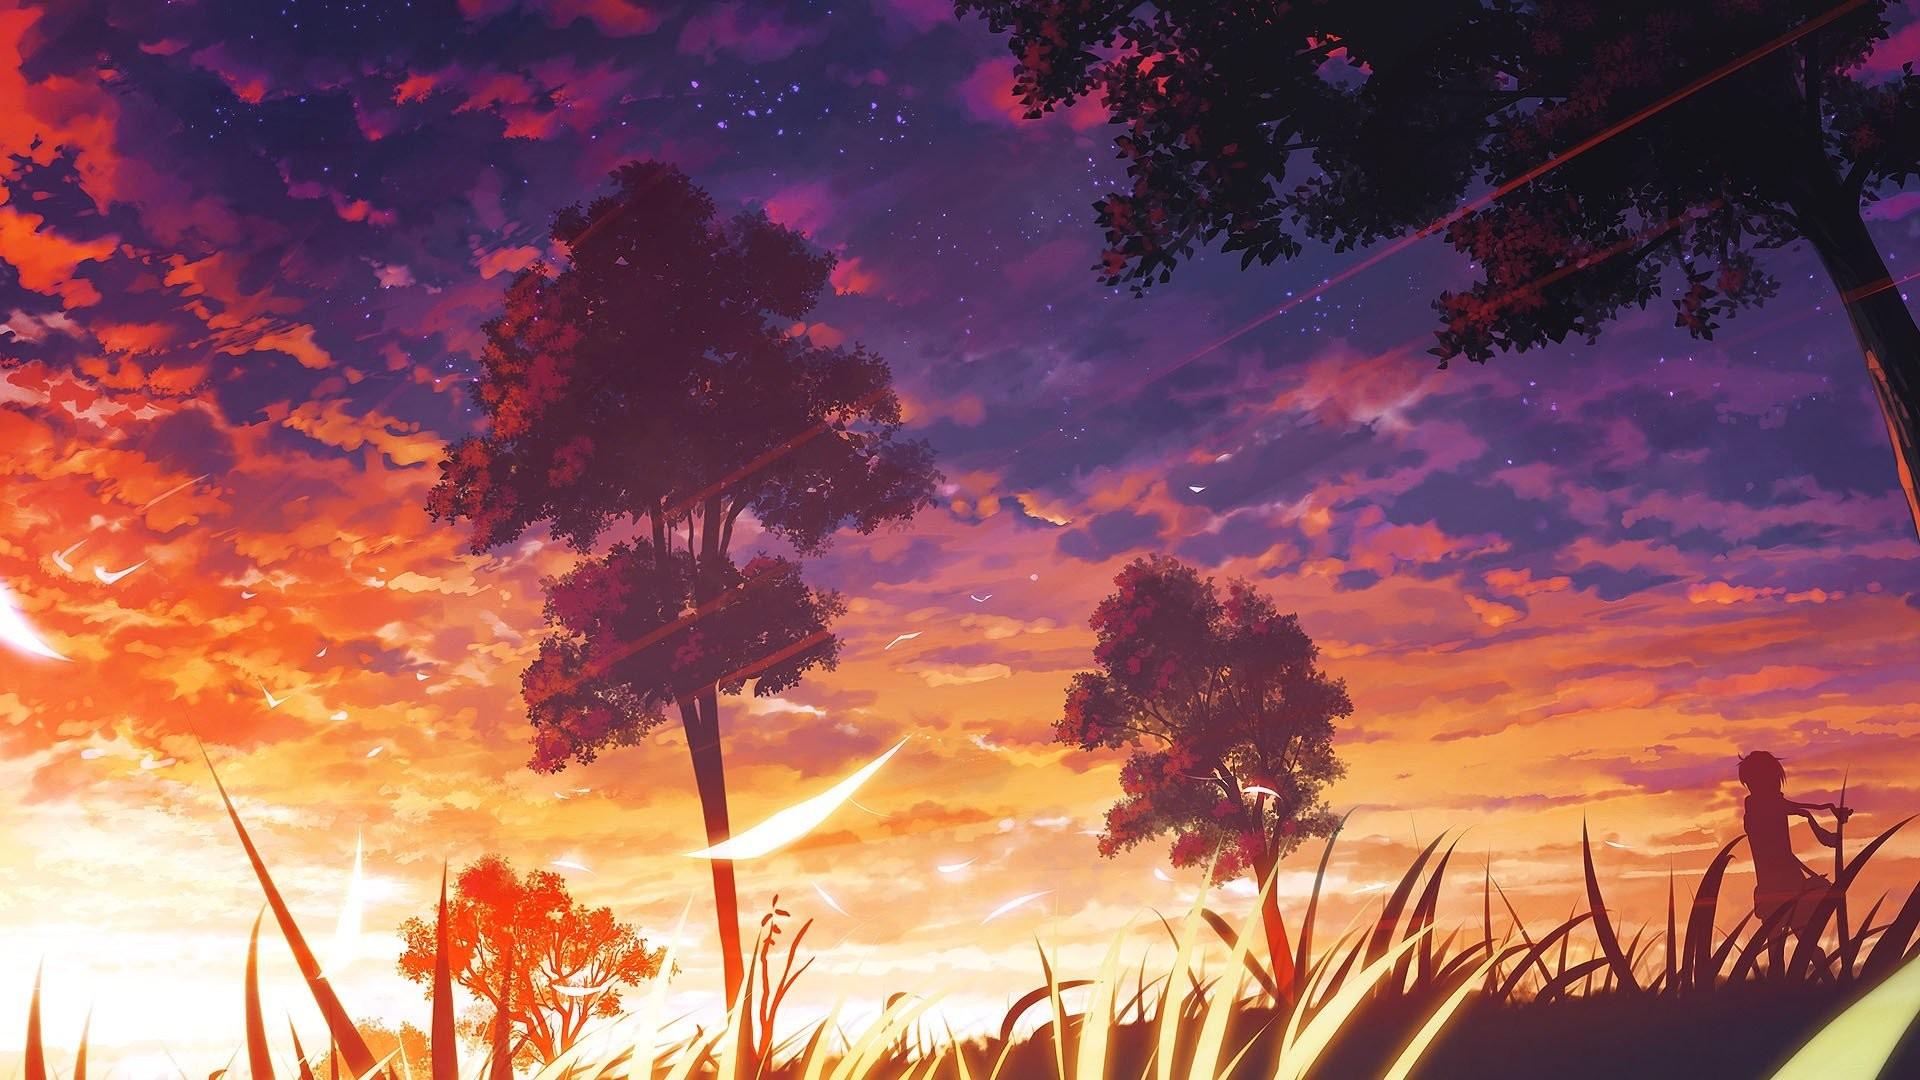 Anime Scenic Sunset Trees